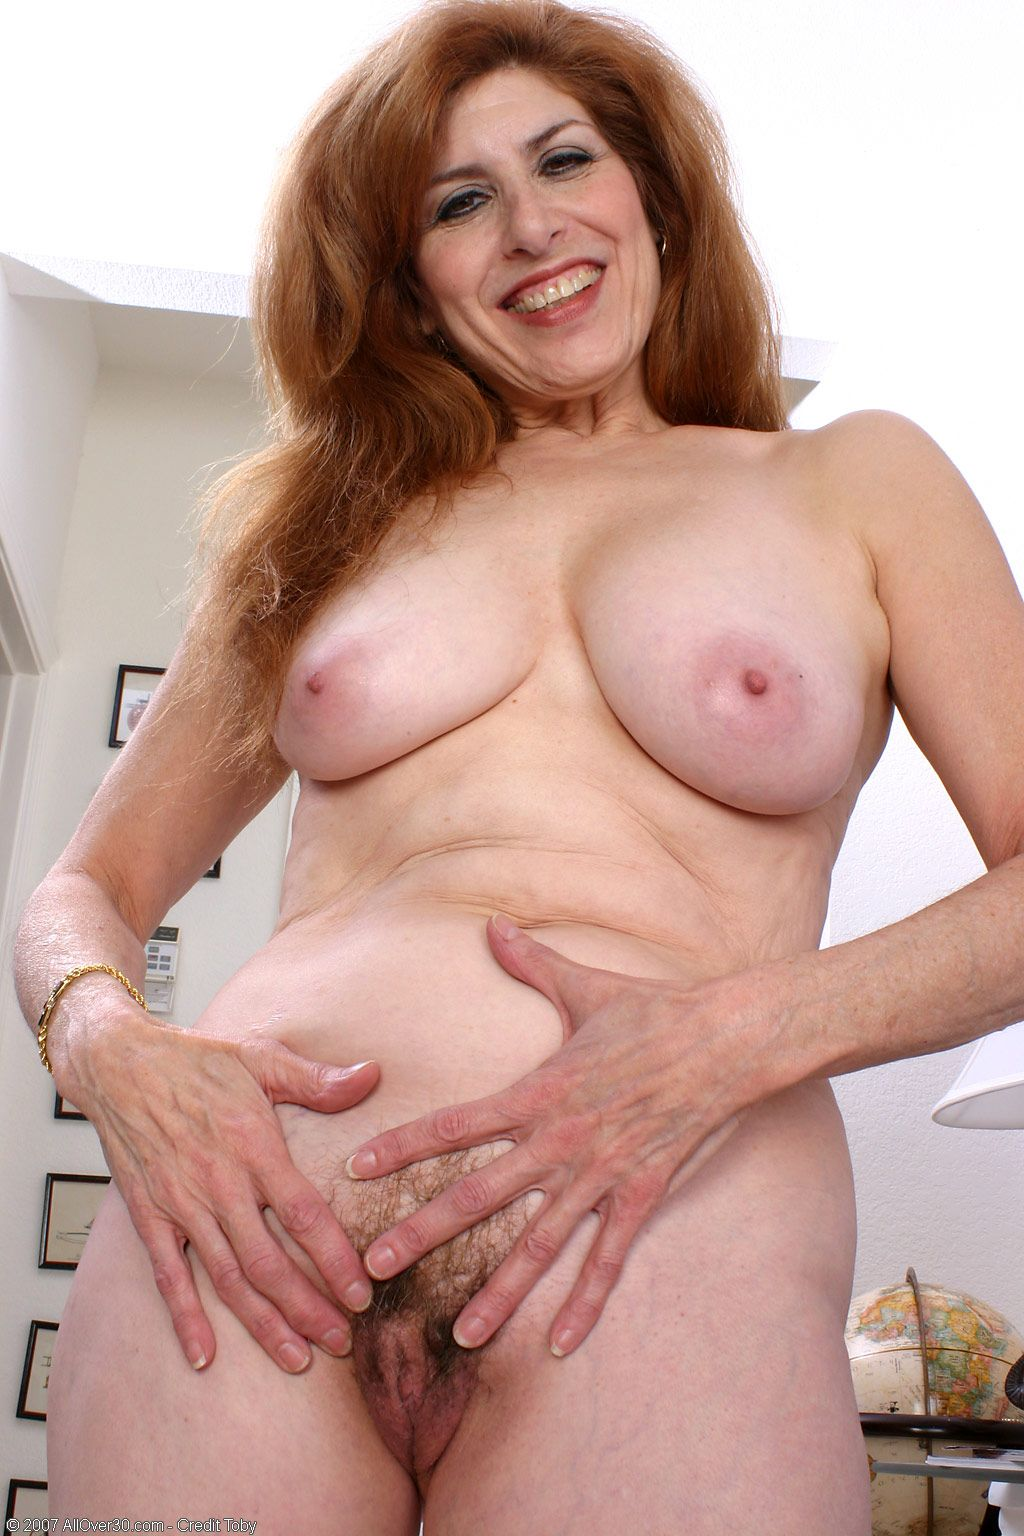 Nude beautiful mature women hd pics